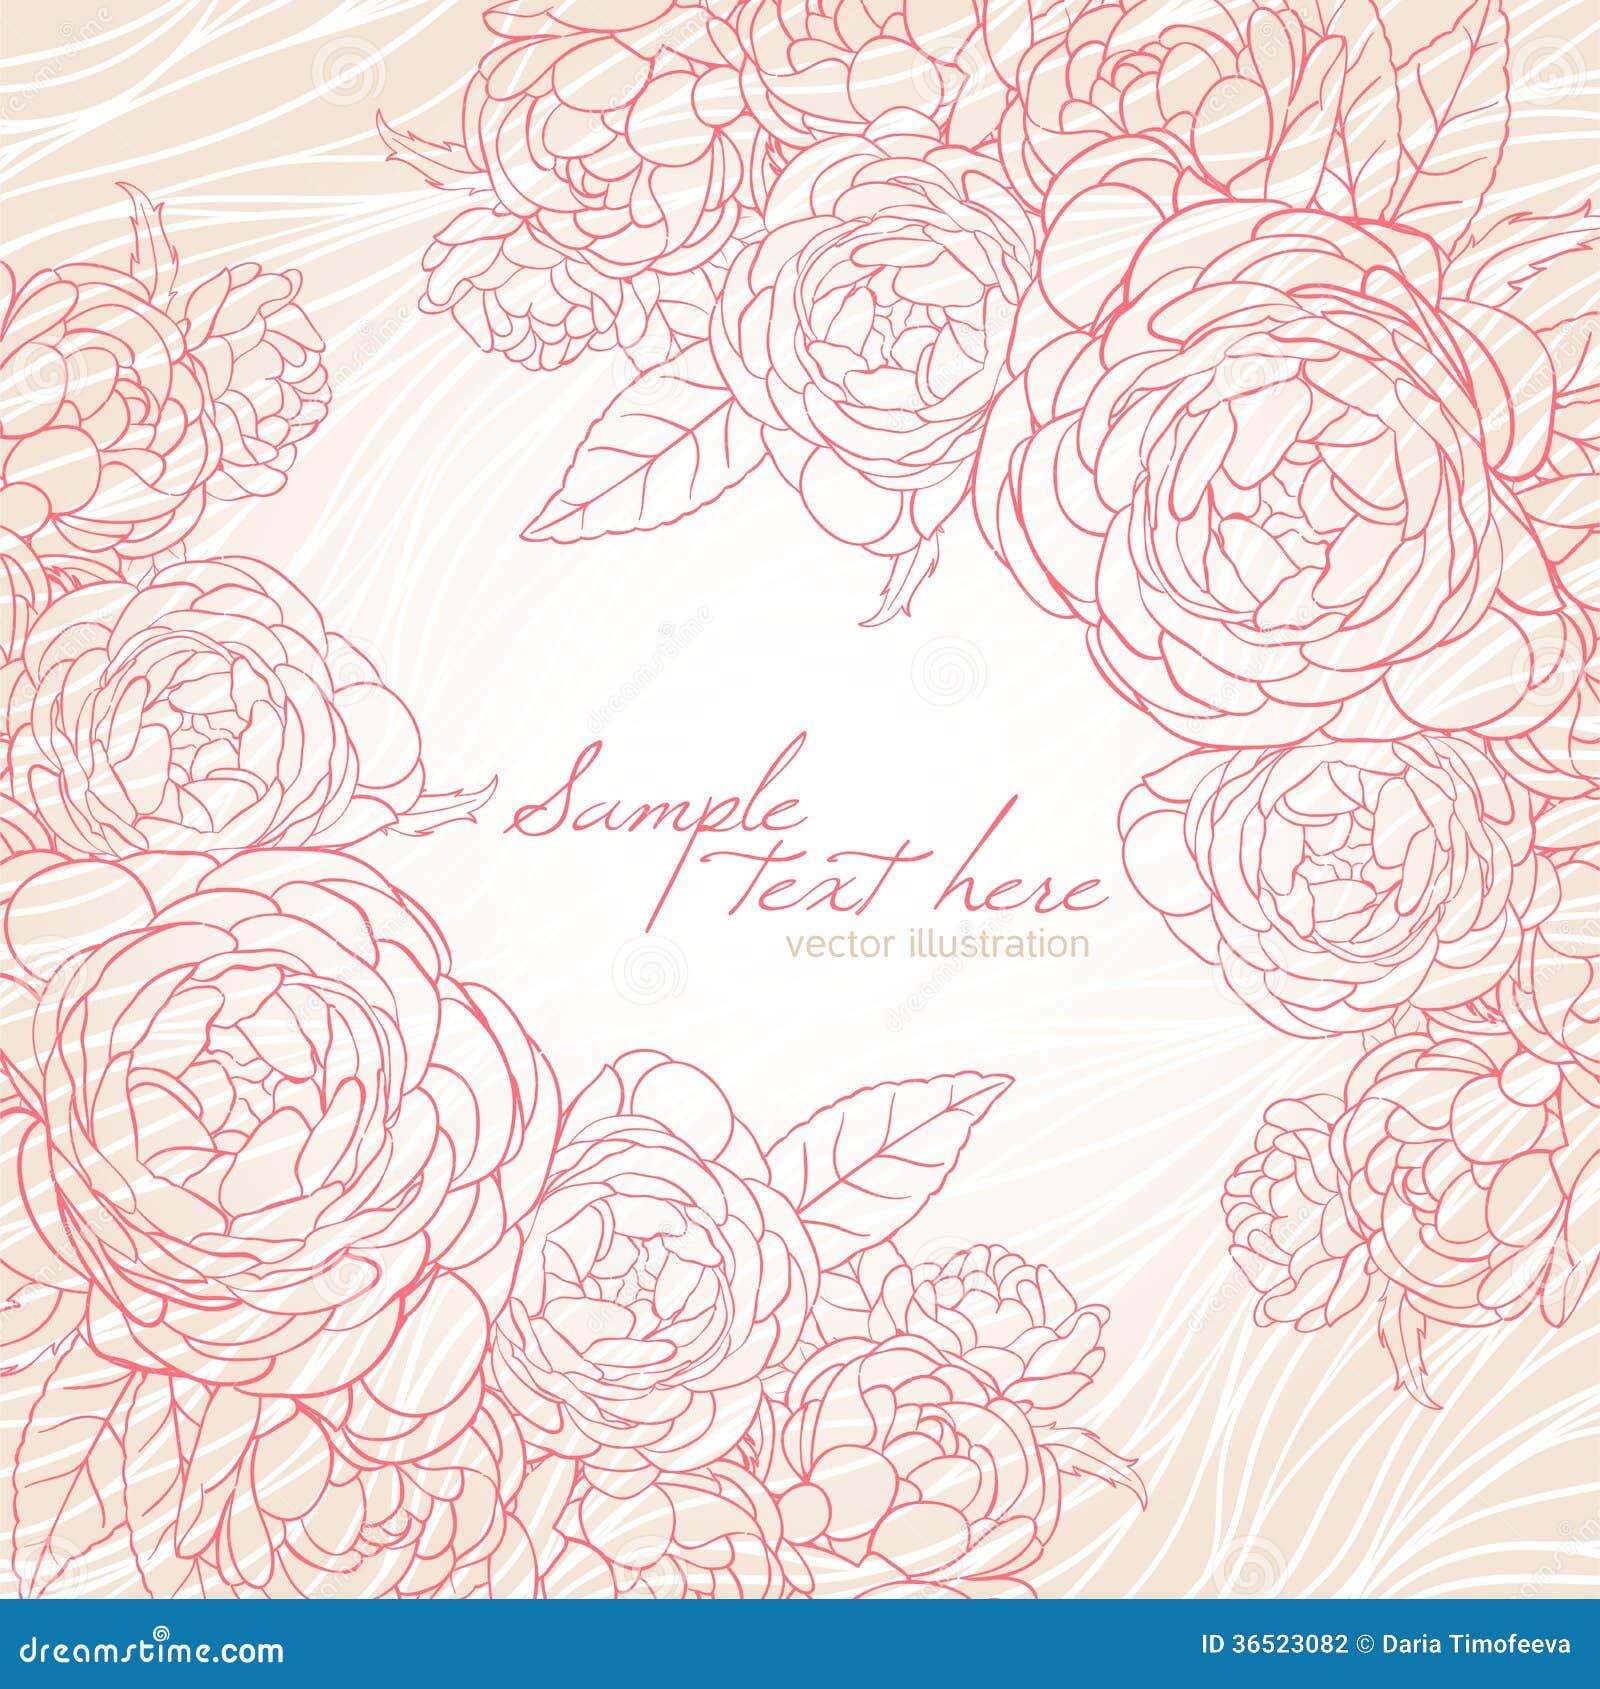 Belle carte avec les roses roses